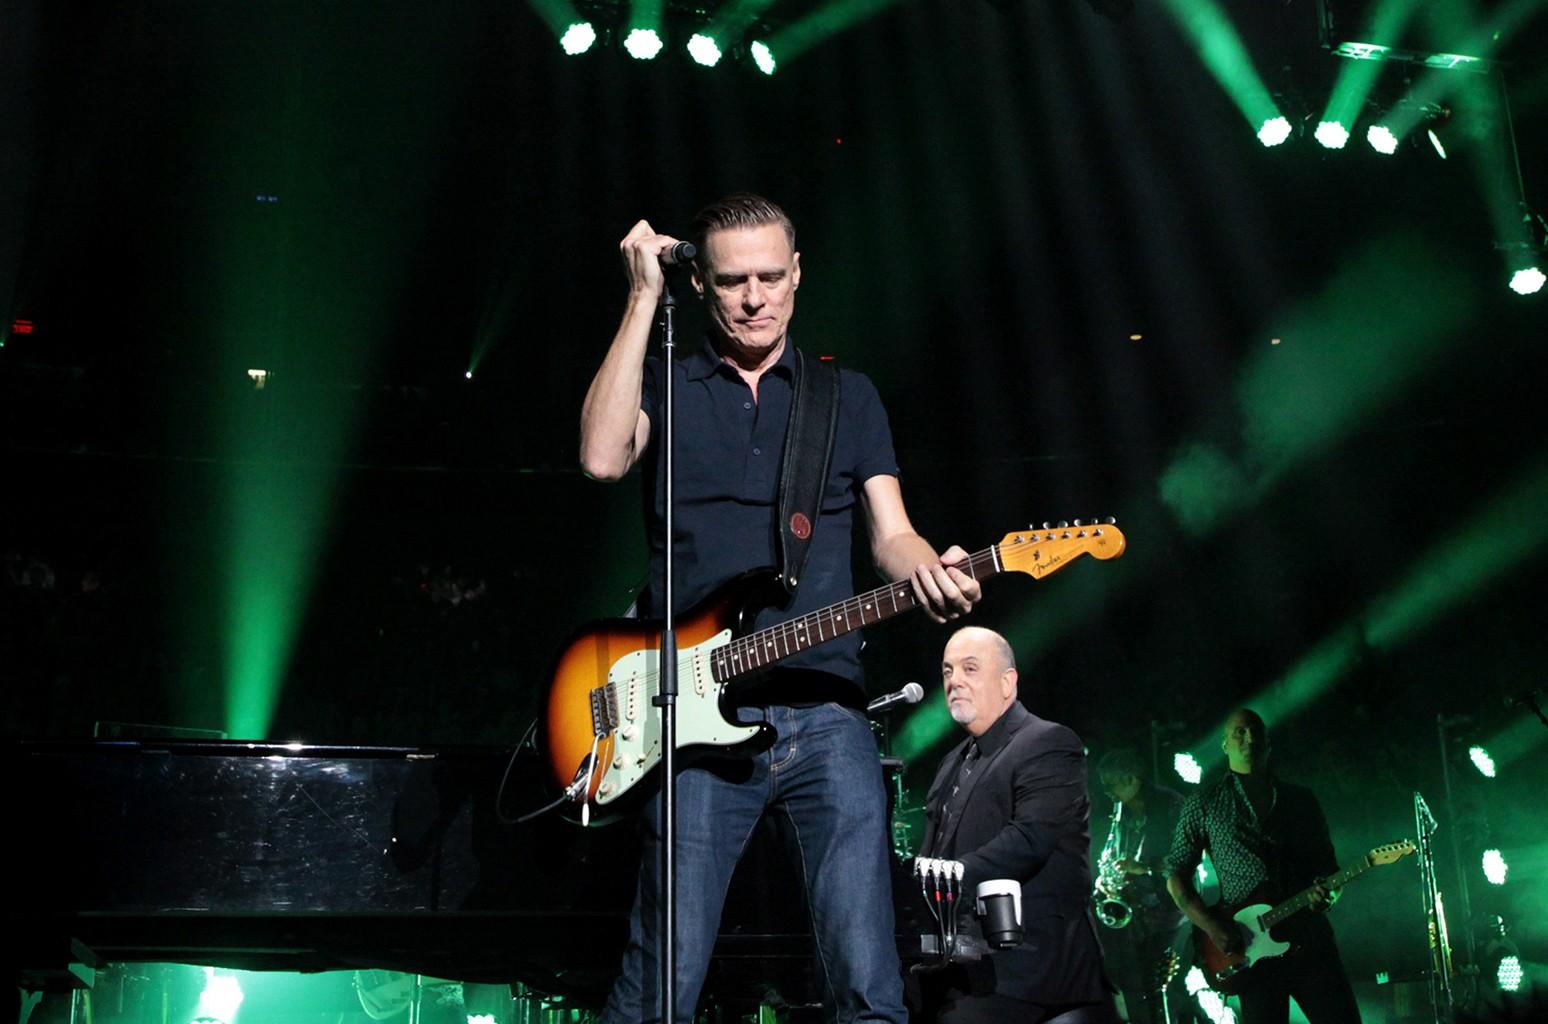 Bryan Adams and Billy Joel perform